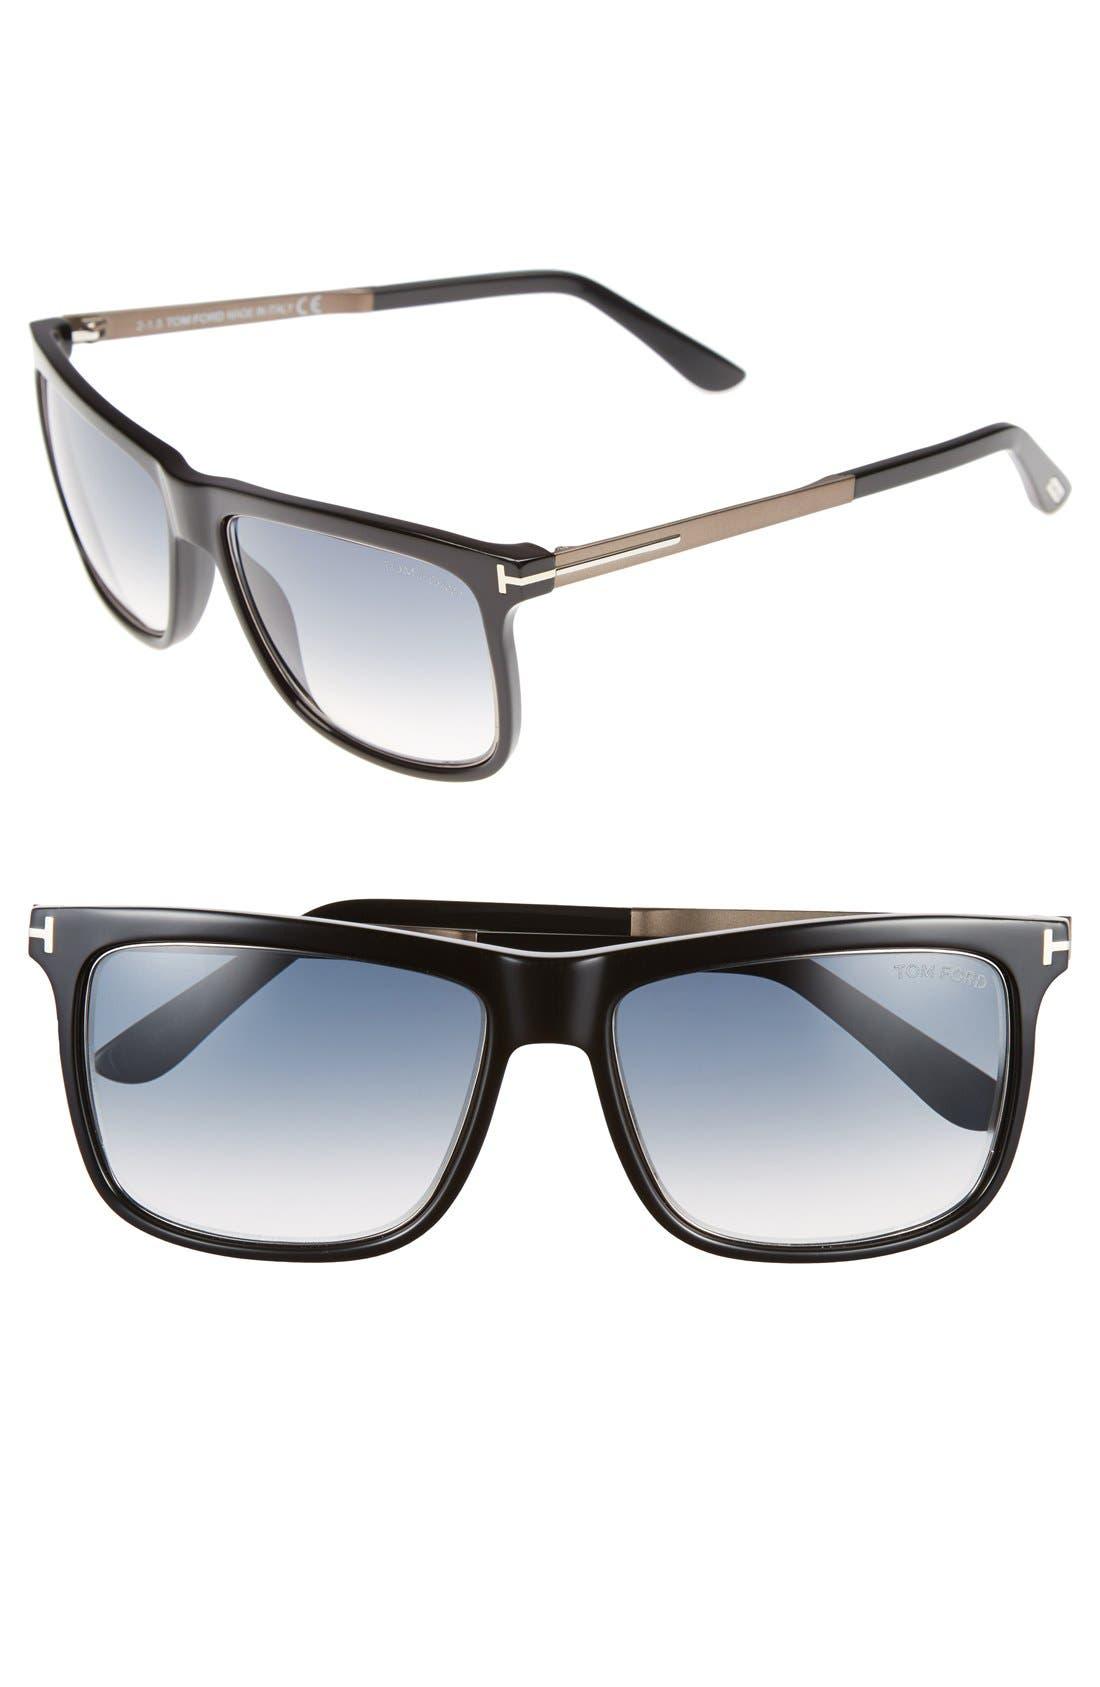 Main Image - Tom Ford 'Karlie' 57mm Retro Sunglasses